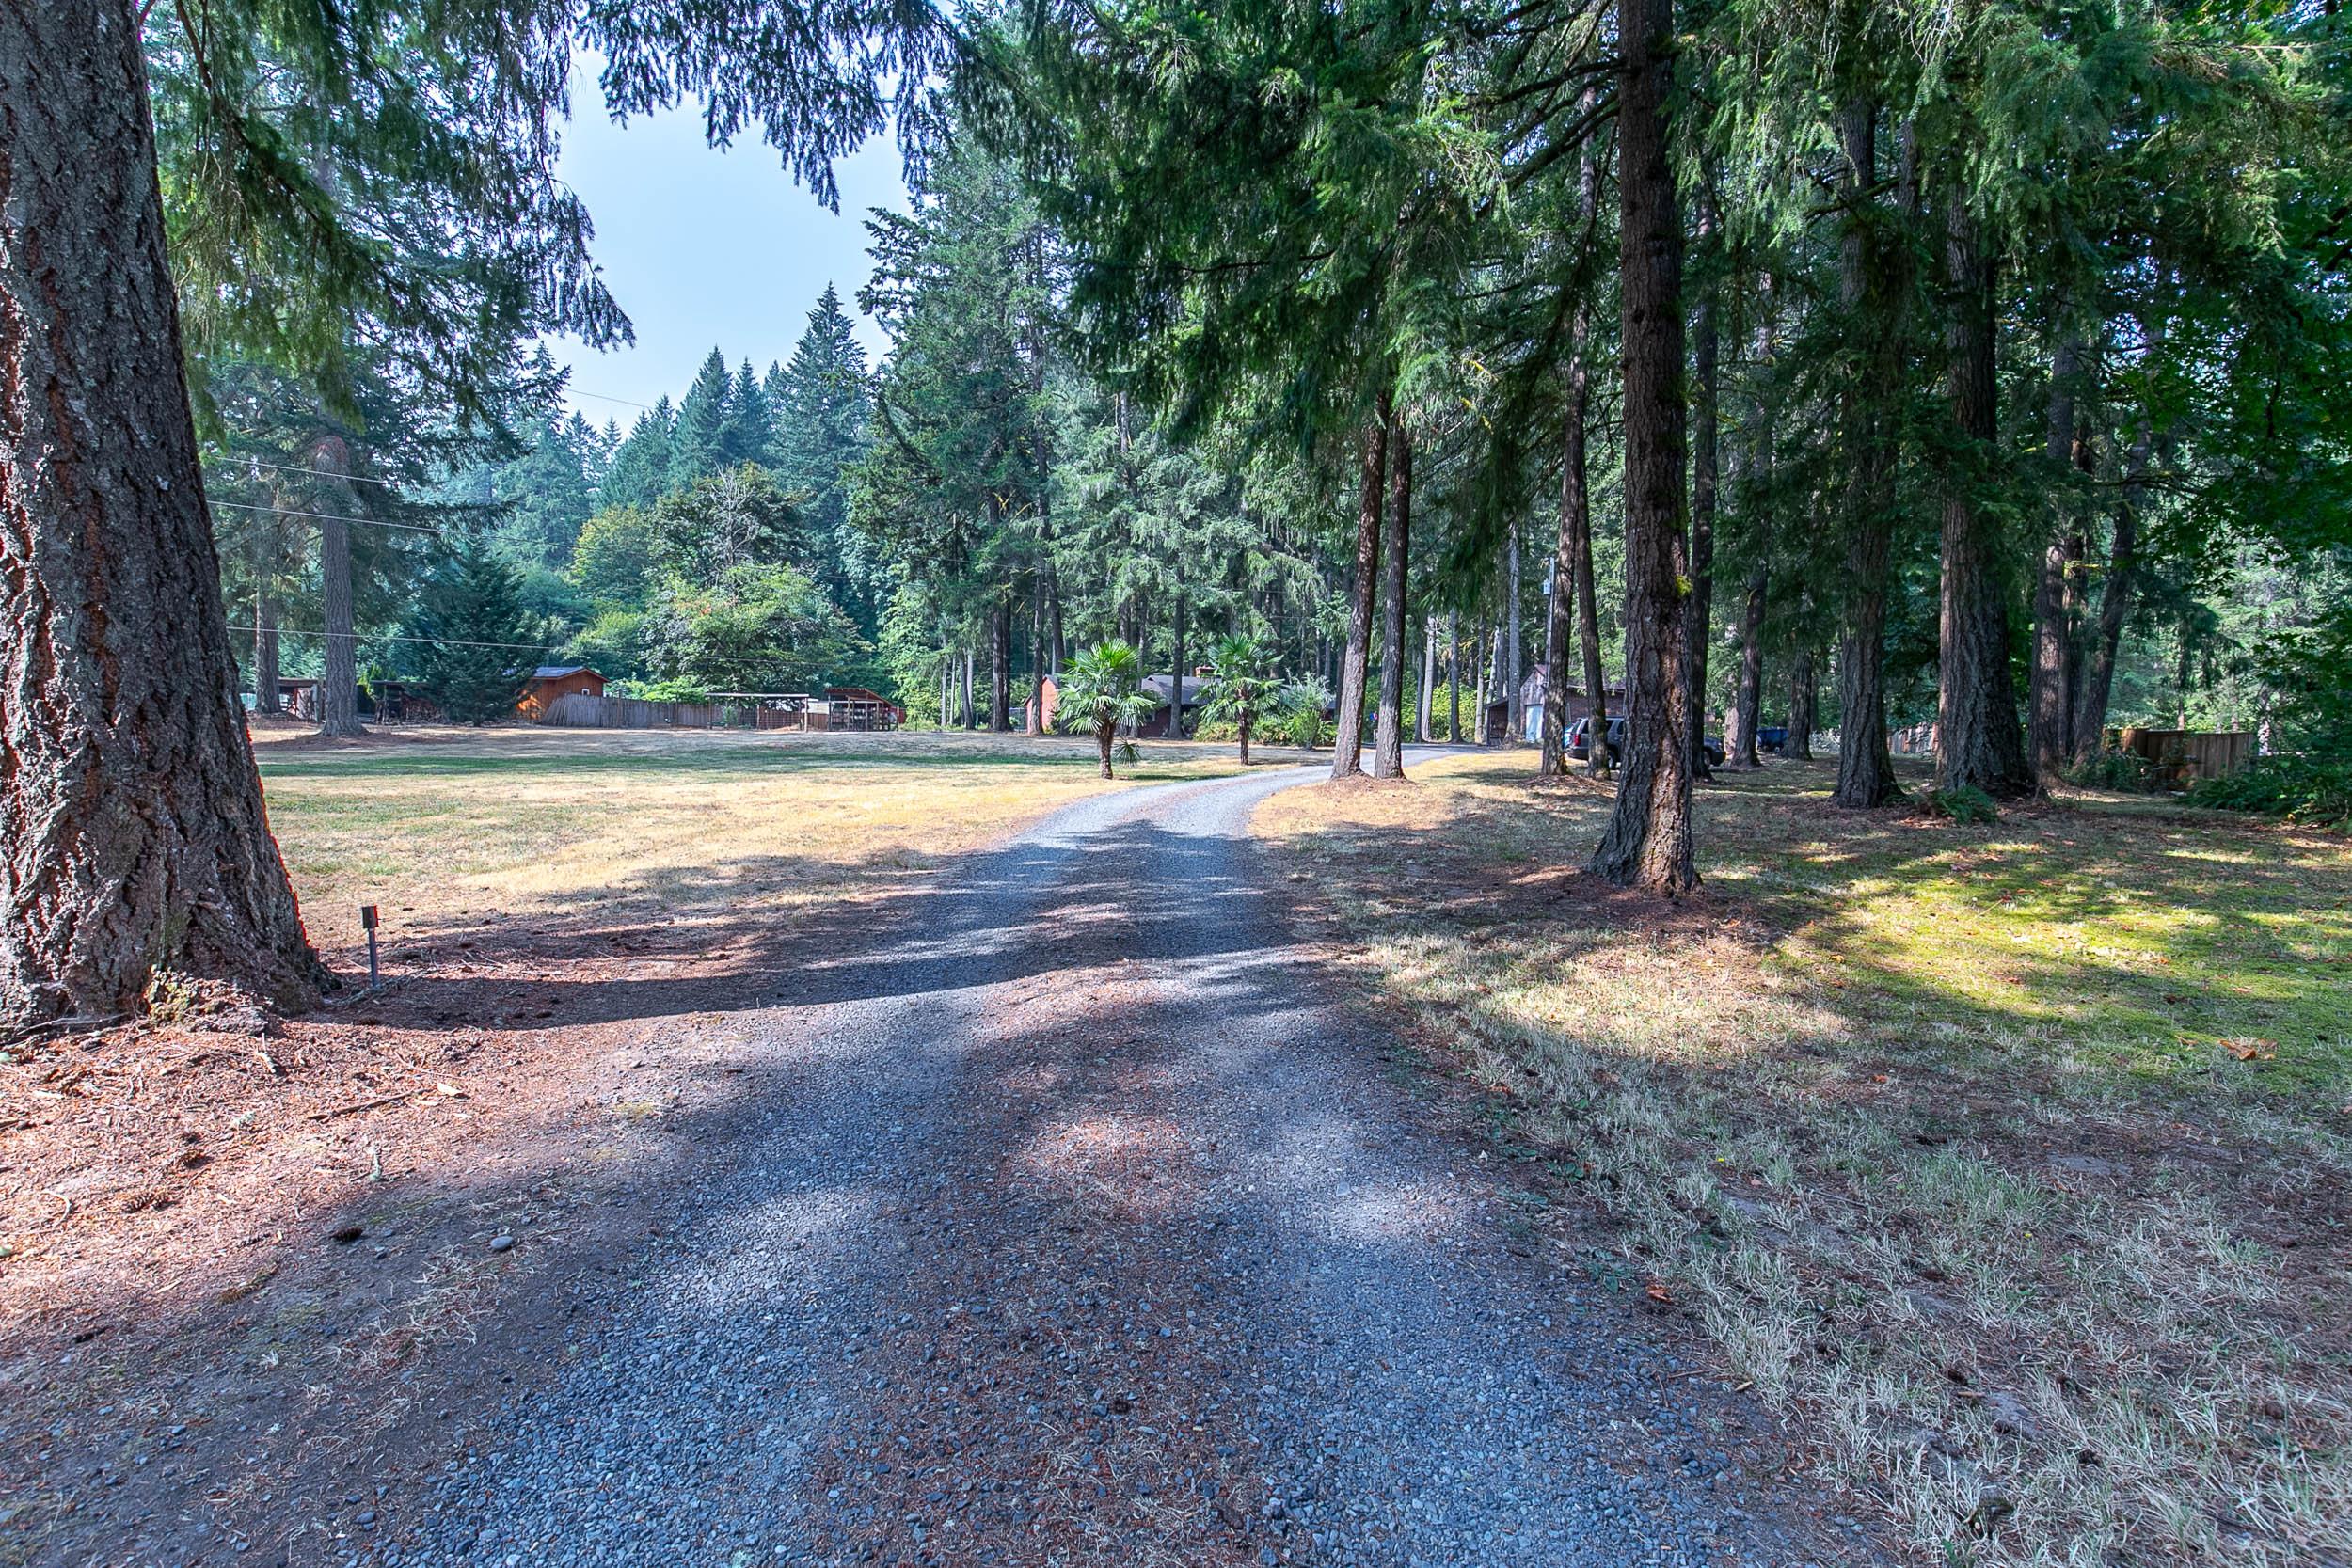 001_16181 S Eaden Rd Oregon City_MG_6640-HDR.jpg